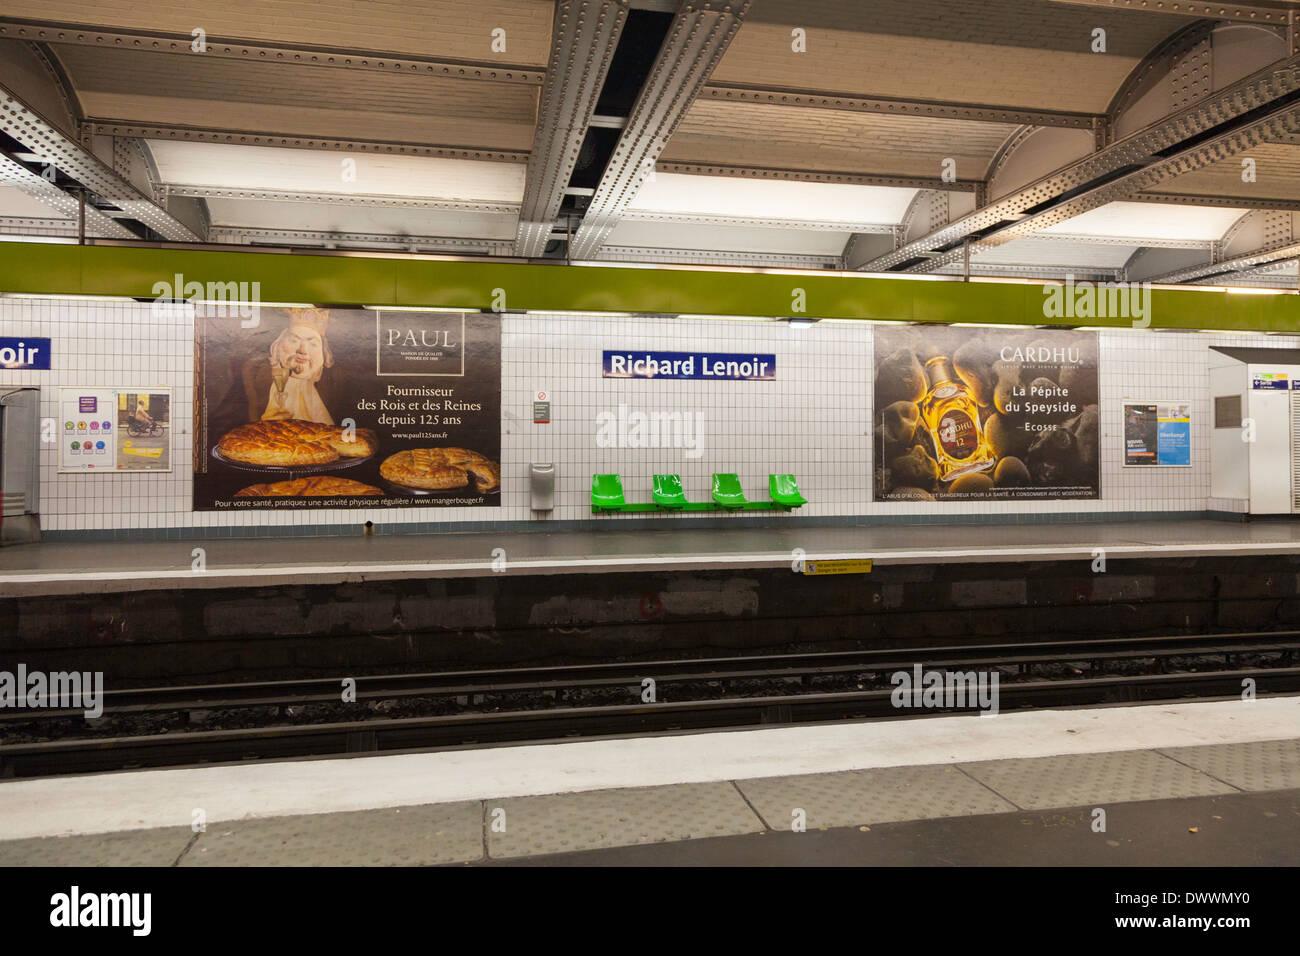 Richard Lenoir metro station, Paris, France - Stock Image